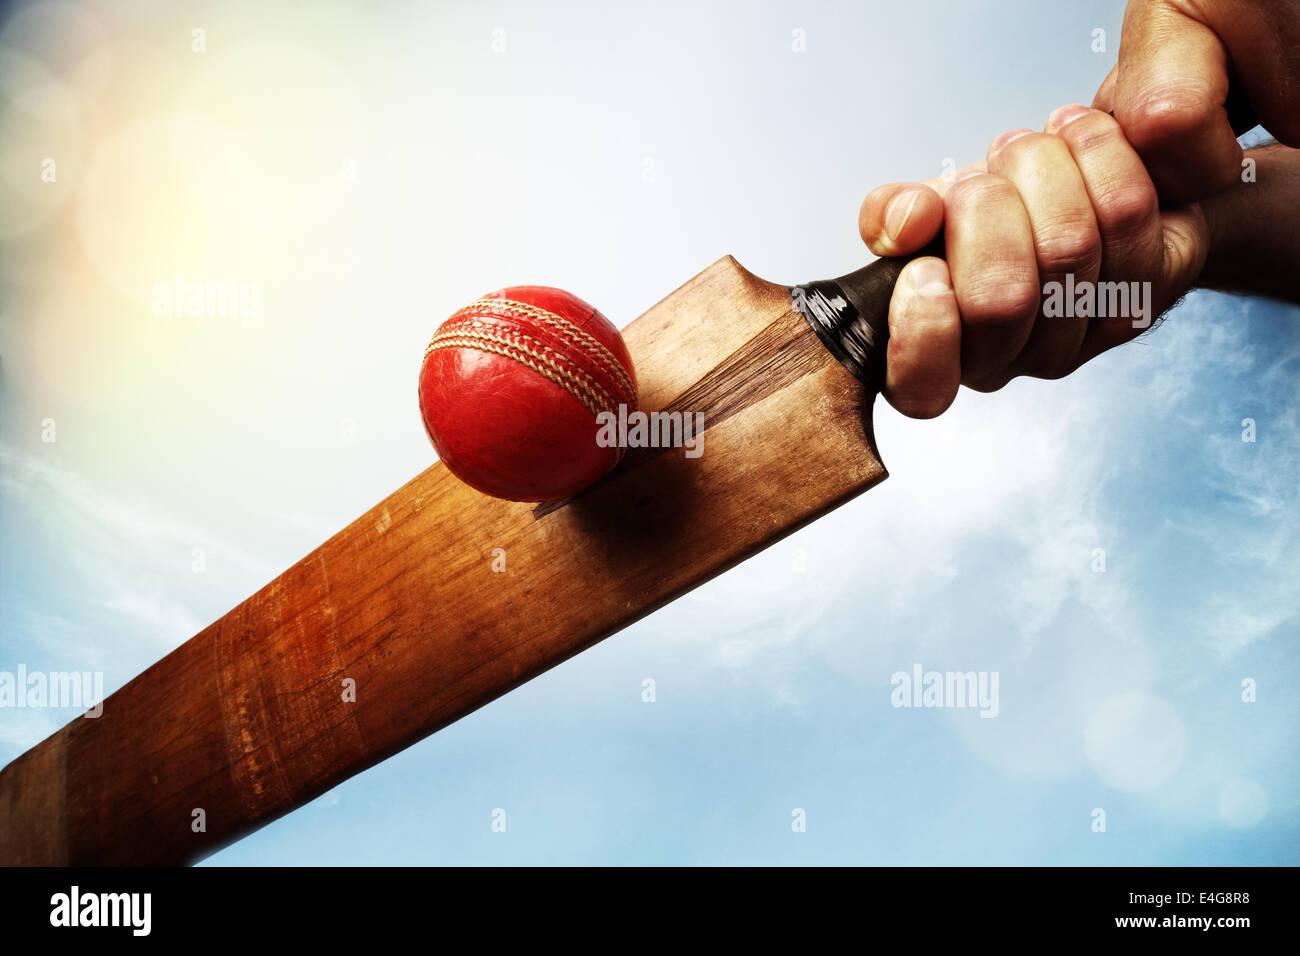 Cricket player hitting ball - Stock Image